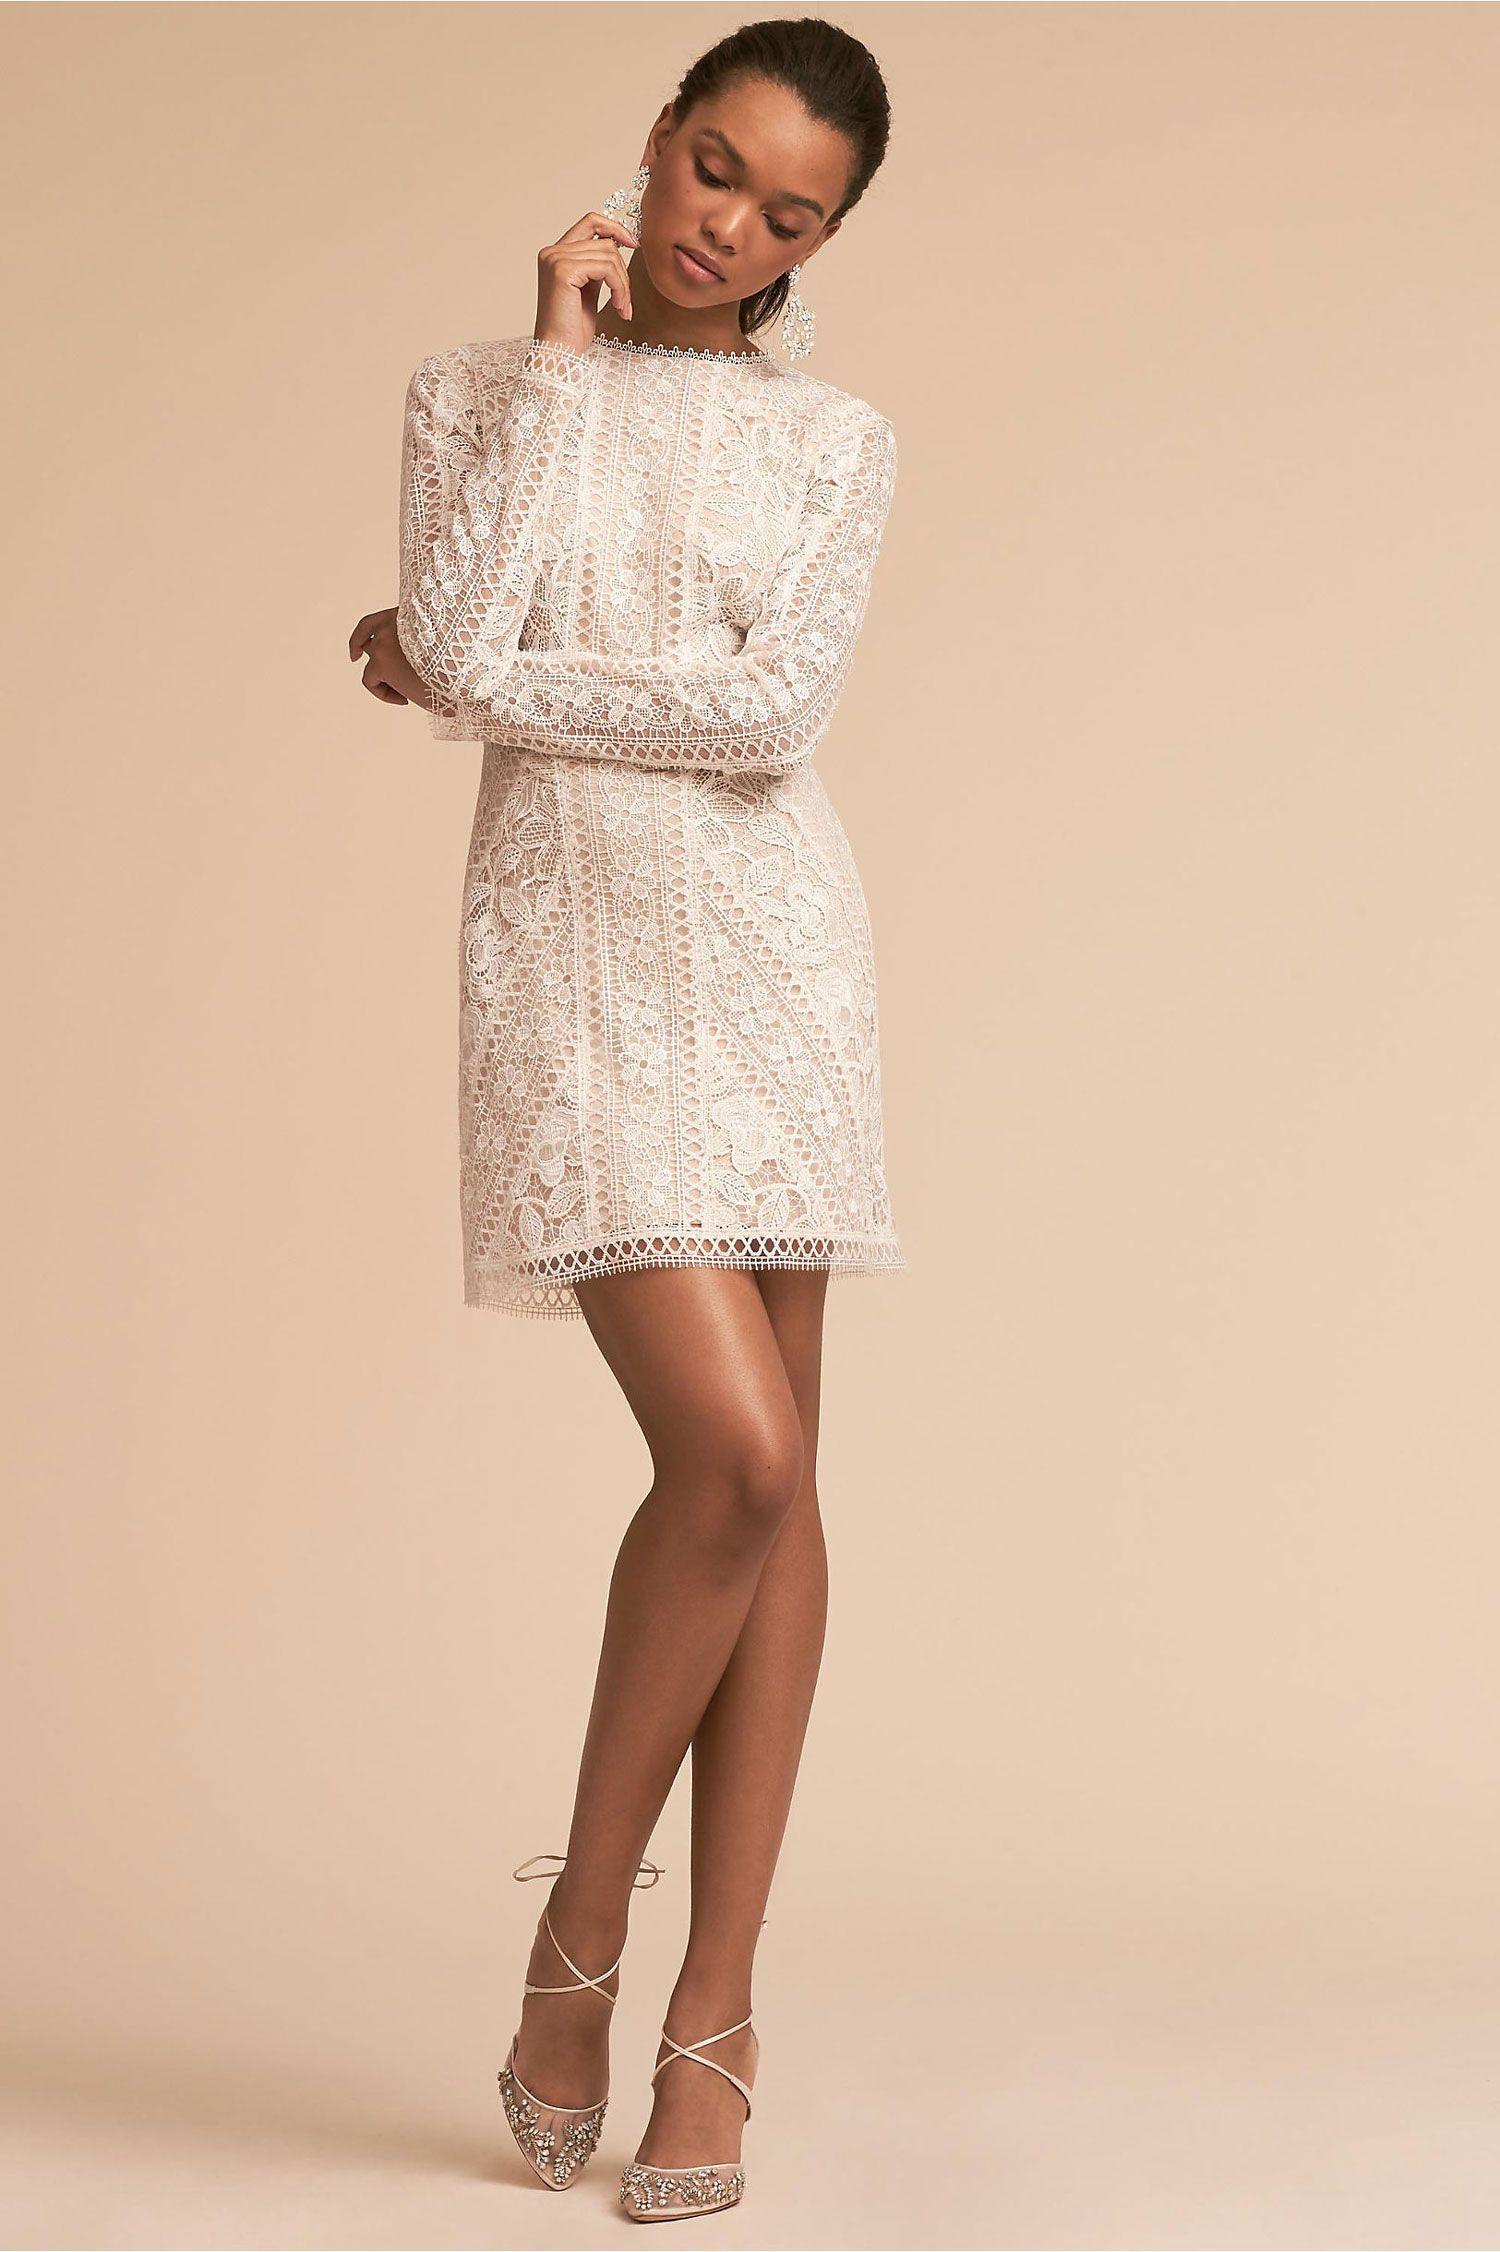 Cason Long Sleeve Lace Mini Dress Tadashi Shoji Bhldn Rehearsal Dinner Bachelorette Party Bri Bridal Shower Dress Rehearsal Dinner Dresses Little White Dresses [ 2252 x 1500 Pixel ]